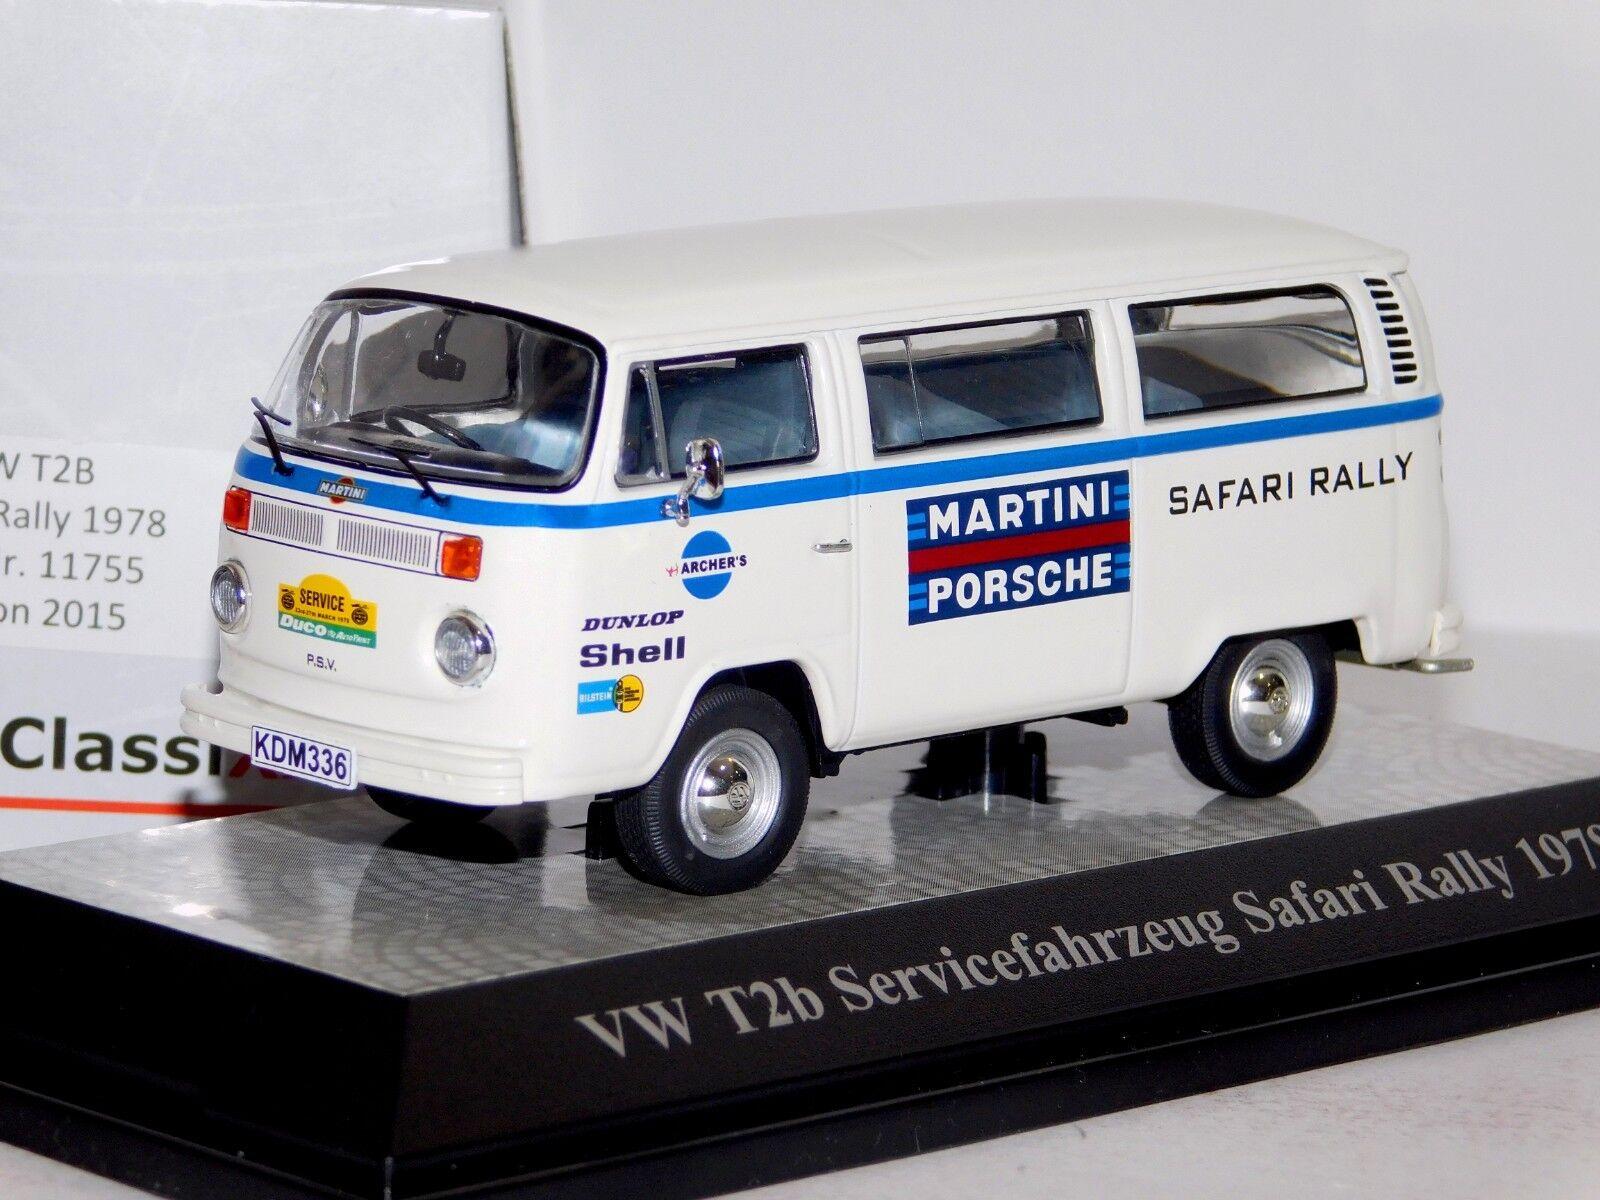 VOLKSWAGEN T2B Porsche asistencia Safari Premium Classixxs Lim. 11755 1 43